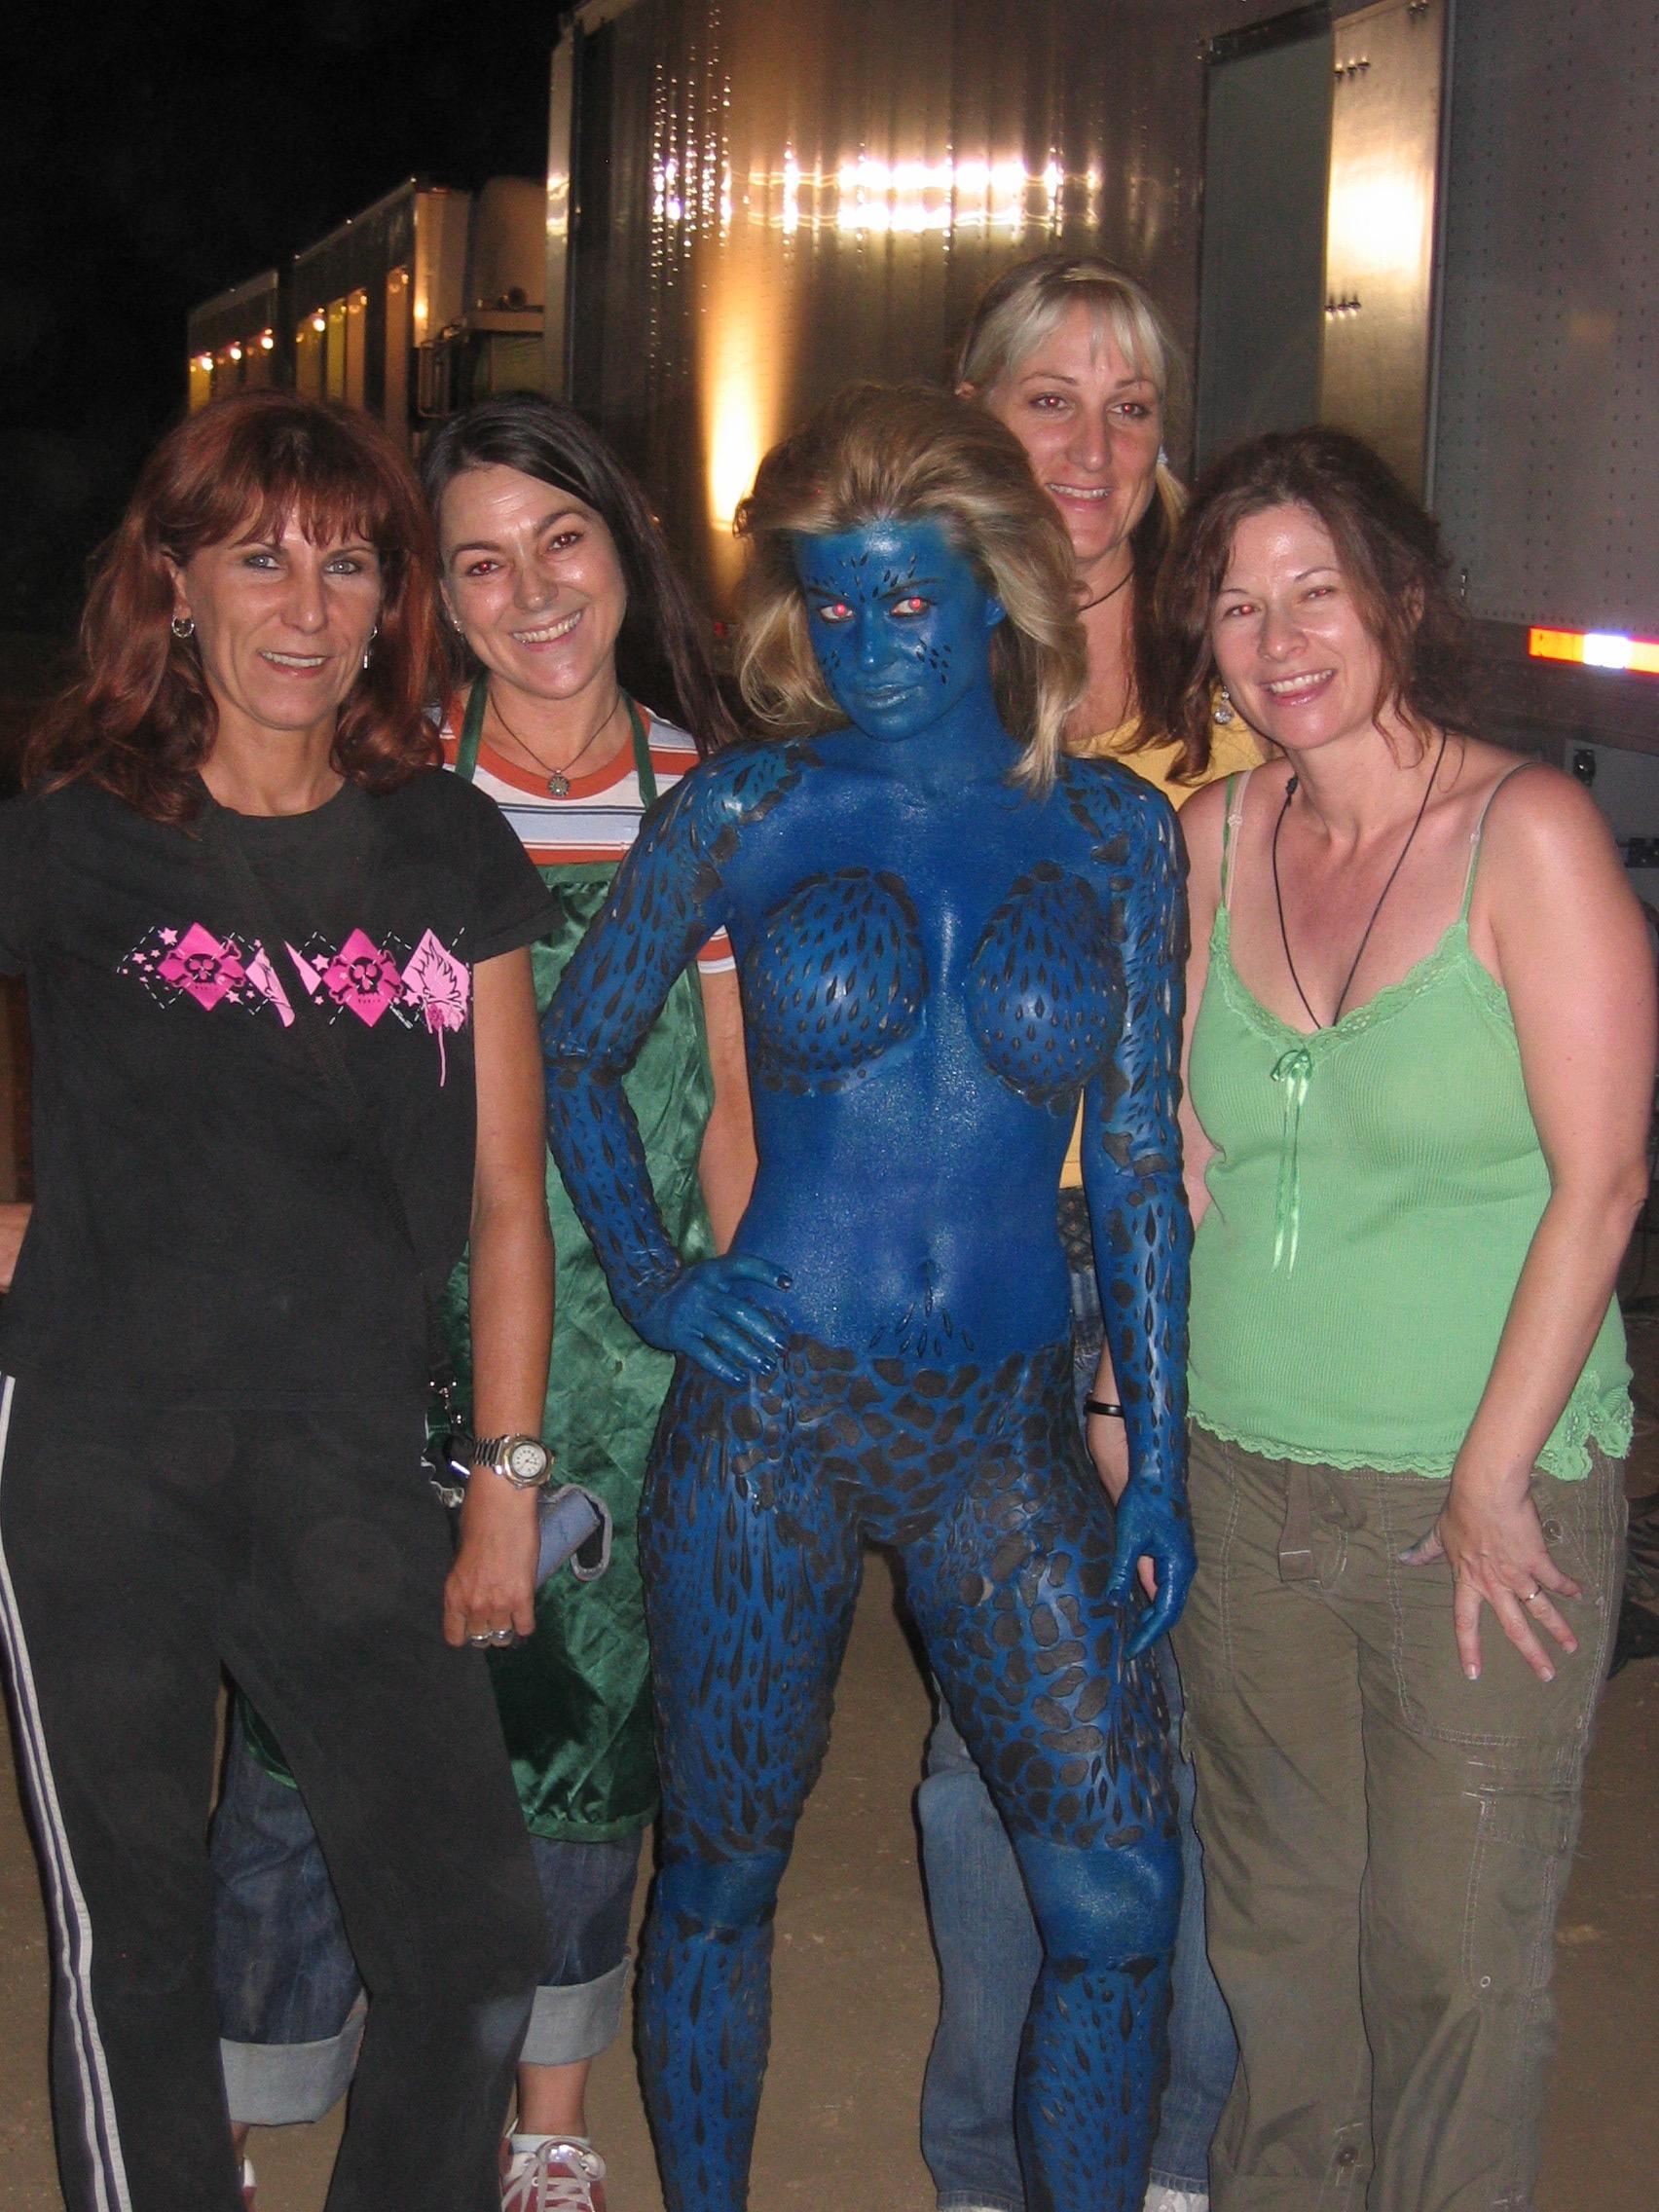 Carmen Electra's Blue Crew